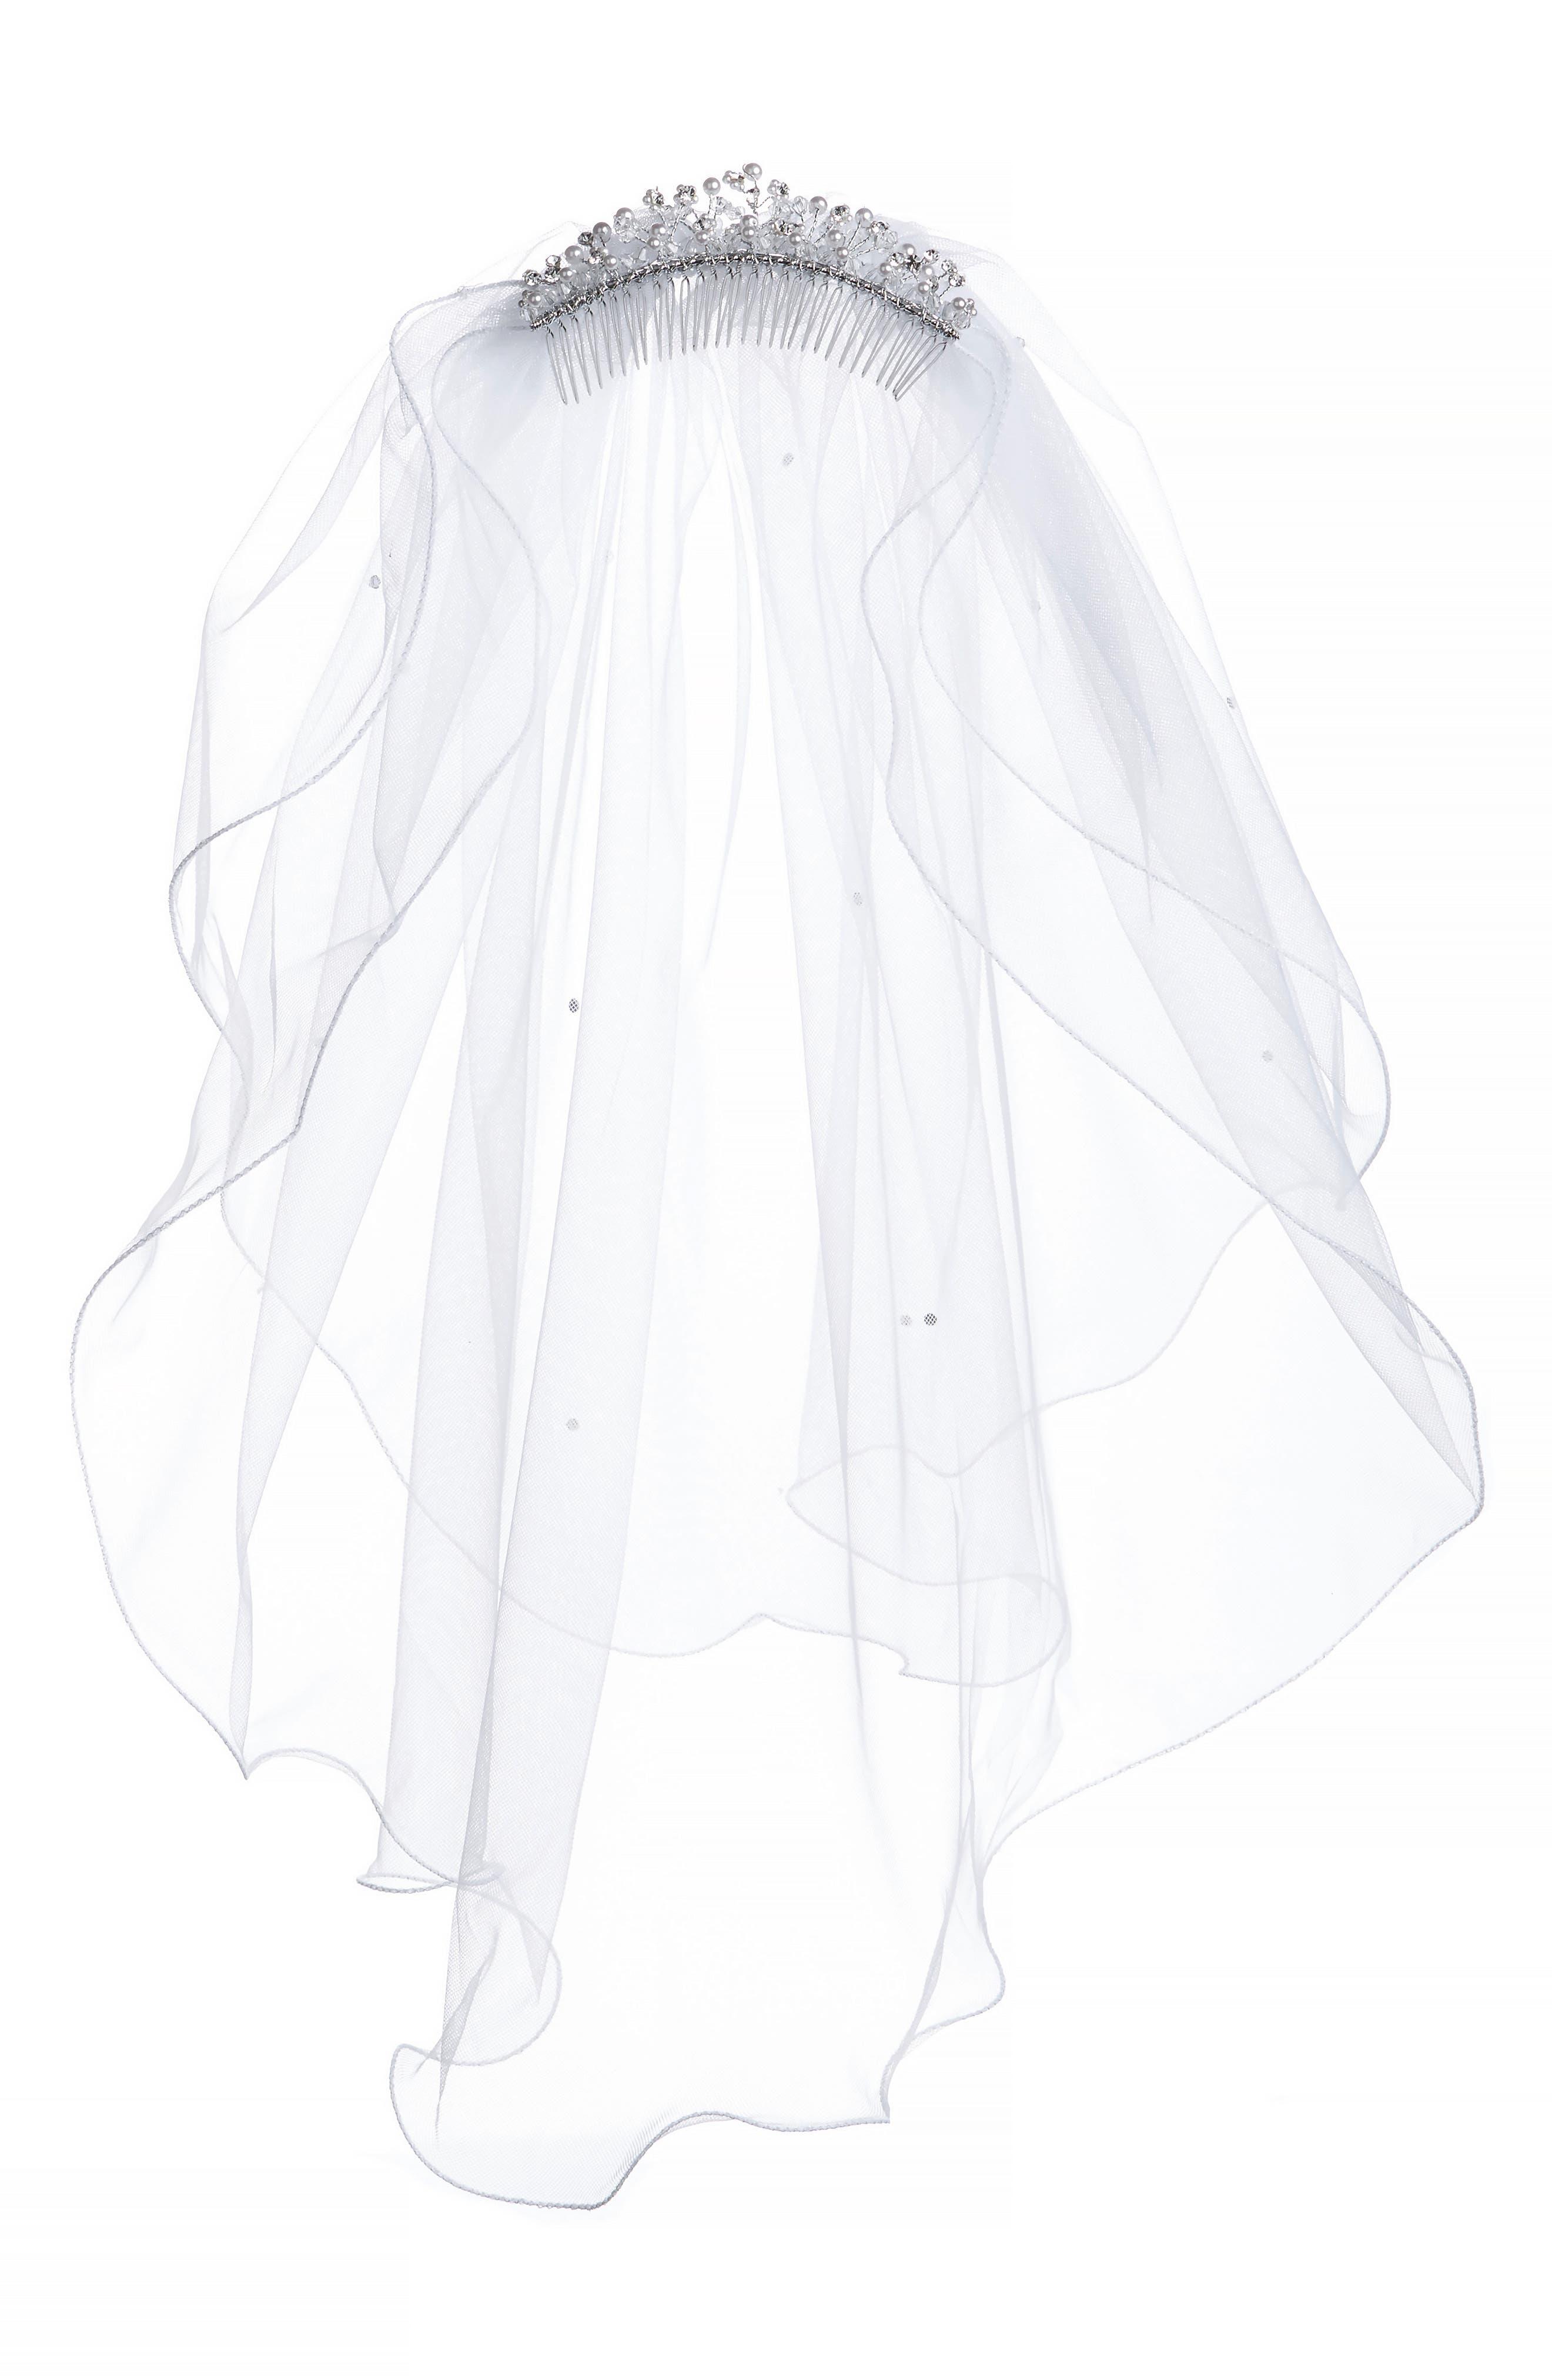 Imitation Pearl Crown & Veil,                         Main,                         color, White